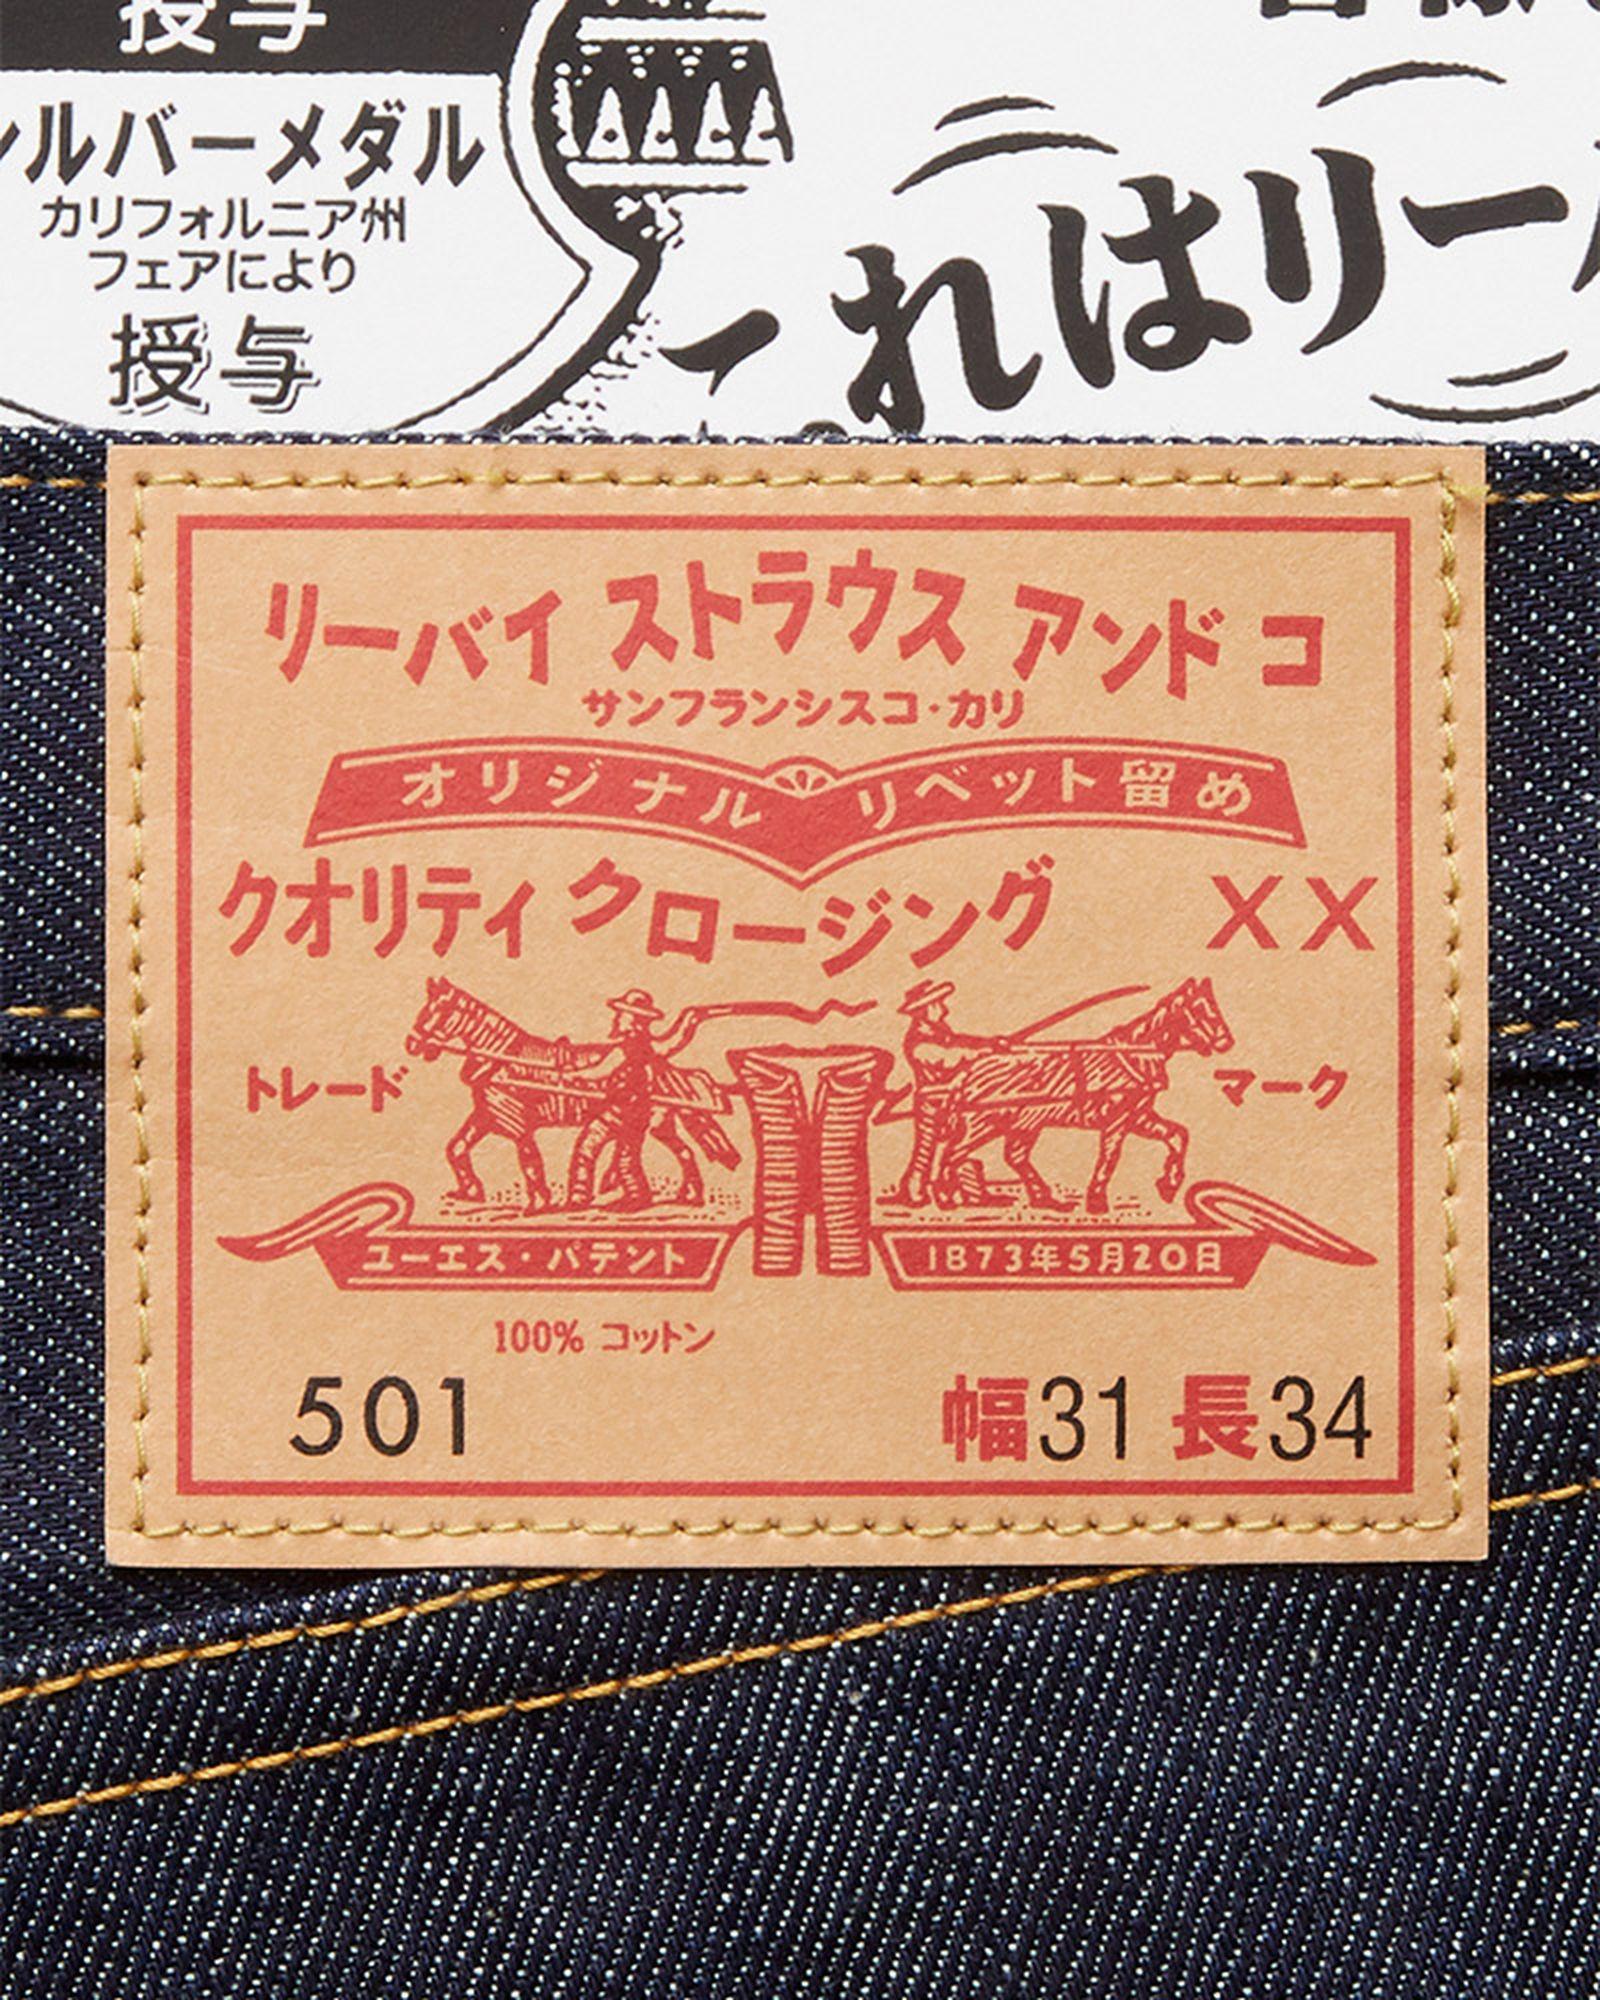 Levi's Vintage Clothing 1966 'Japan' 501 jeans details